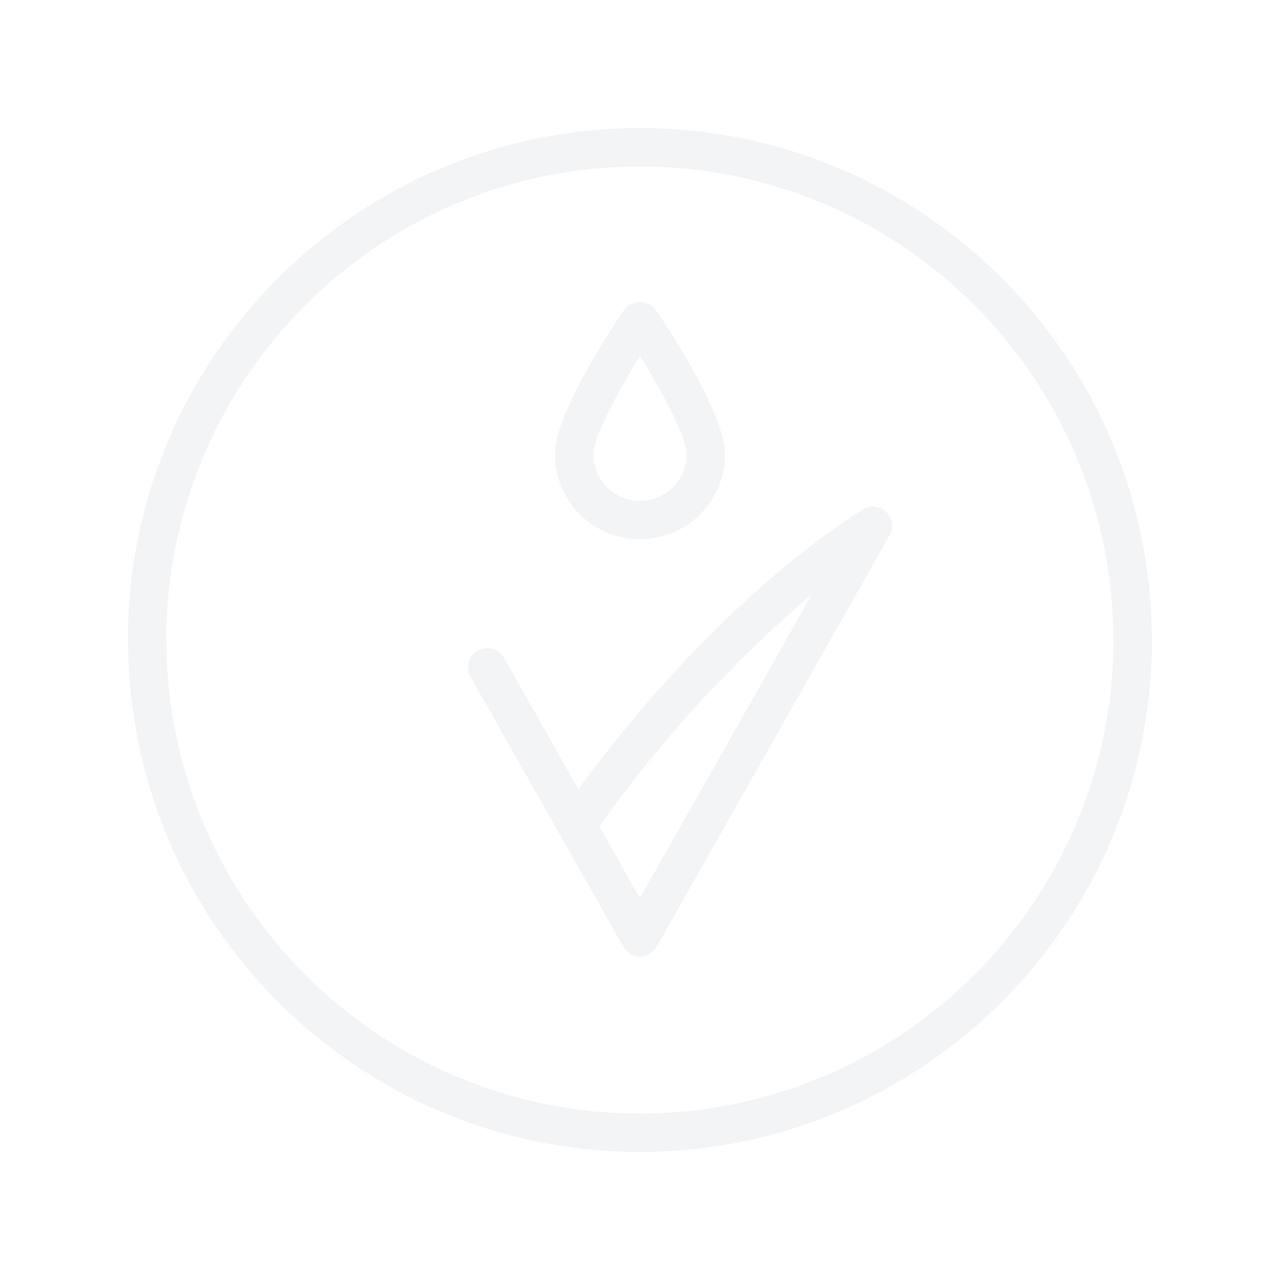 MIZON Collagen Power Firming Eye Cream 10ml (Tube)